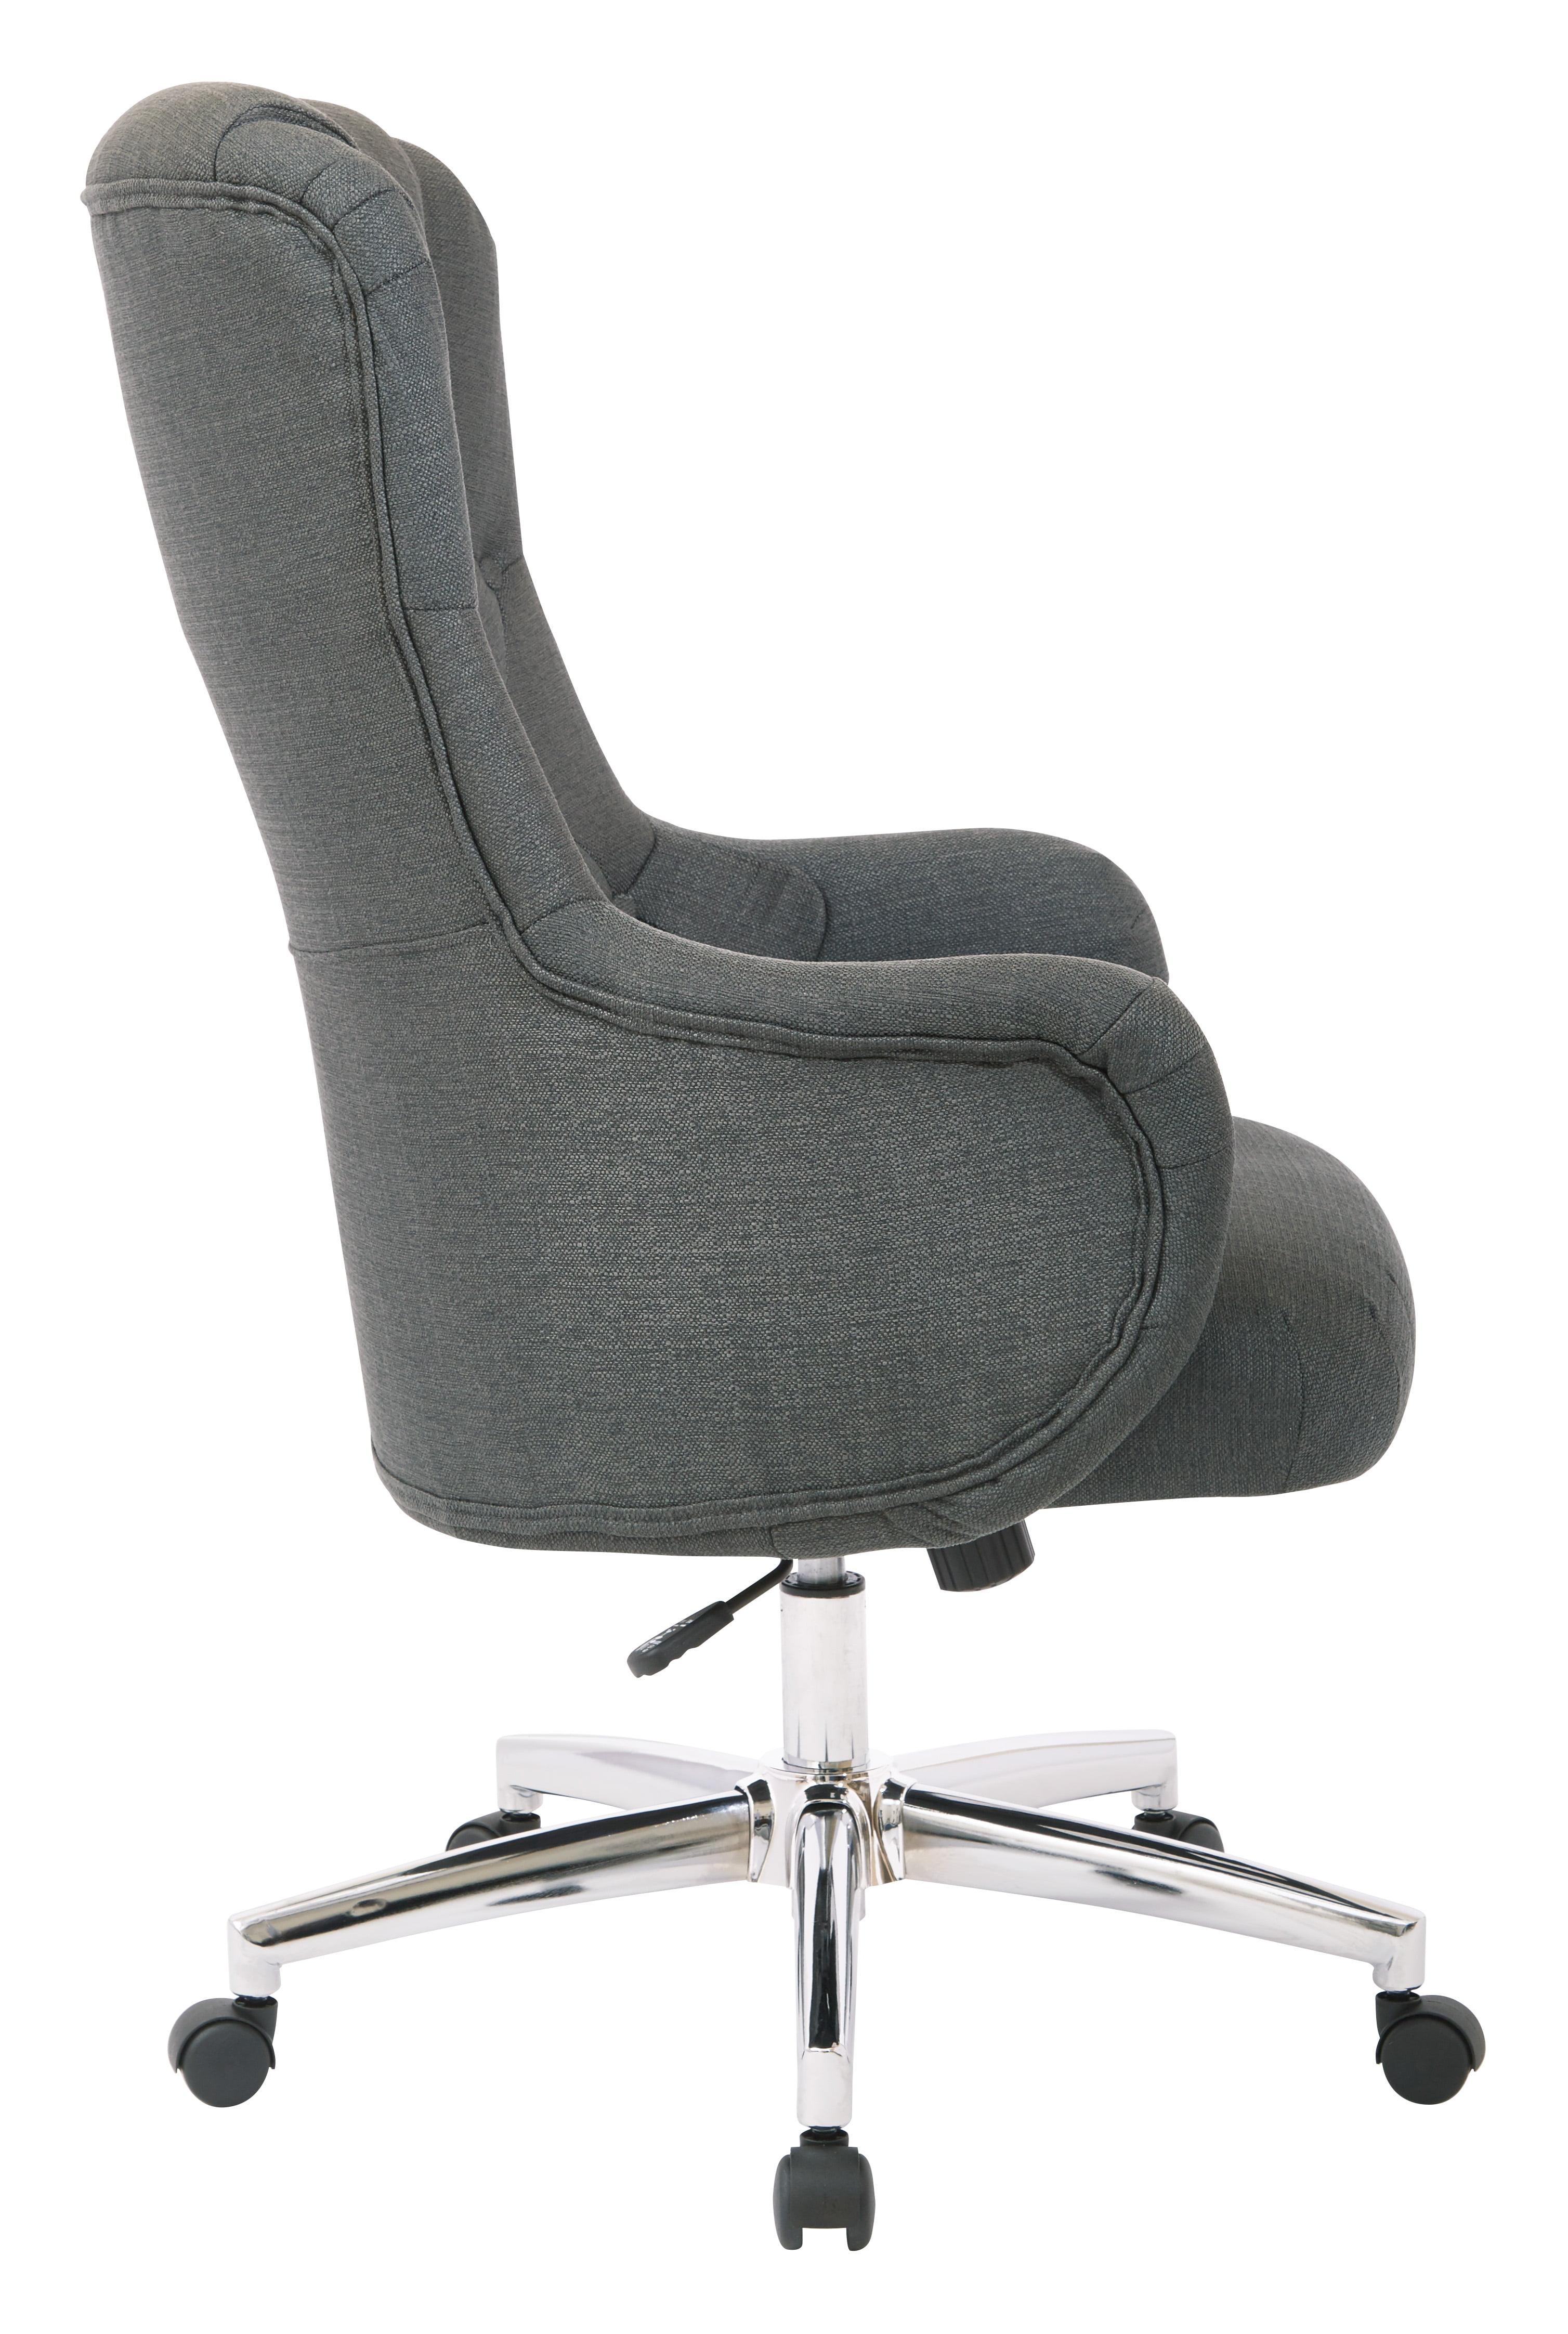 OSP Home Furnishings Ariel Desk Chair in Klein Azure, Semi